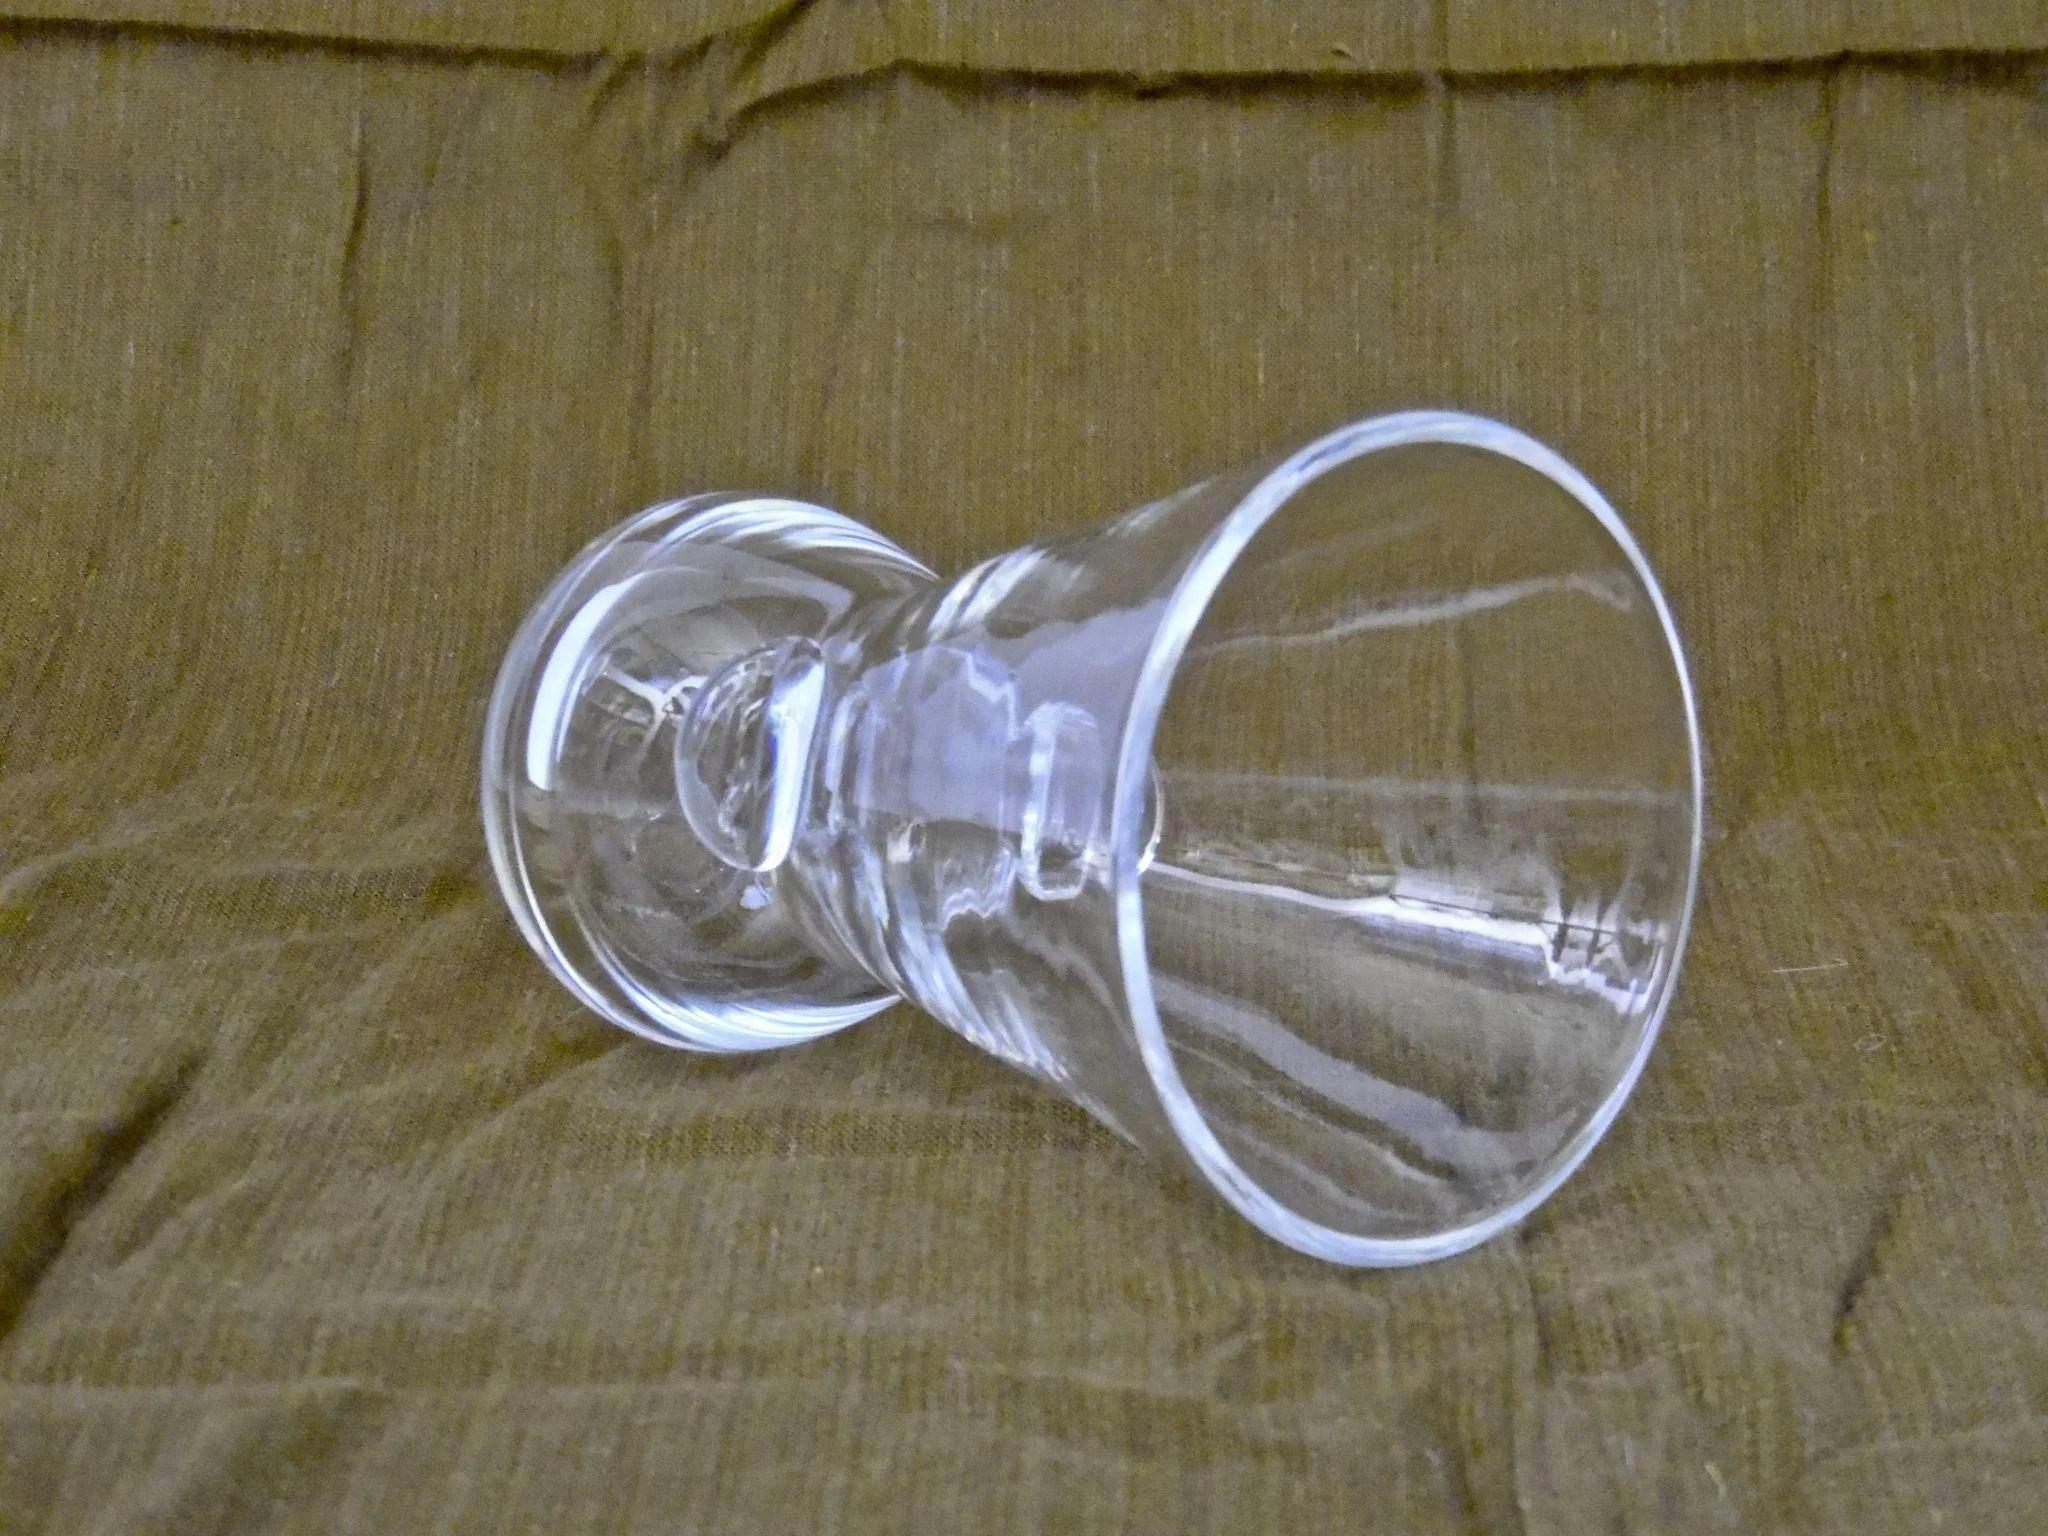 steuben glass vase of steuben glass signet vase ahmeek antiques and decorative arts llc within steuben glass signet vase click to expand